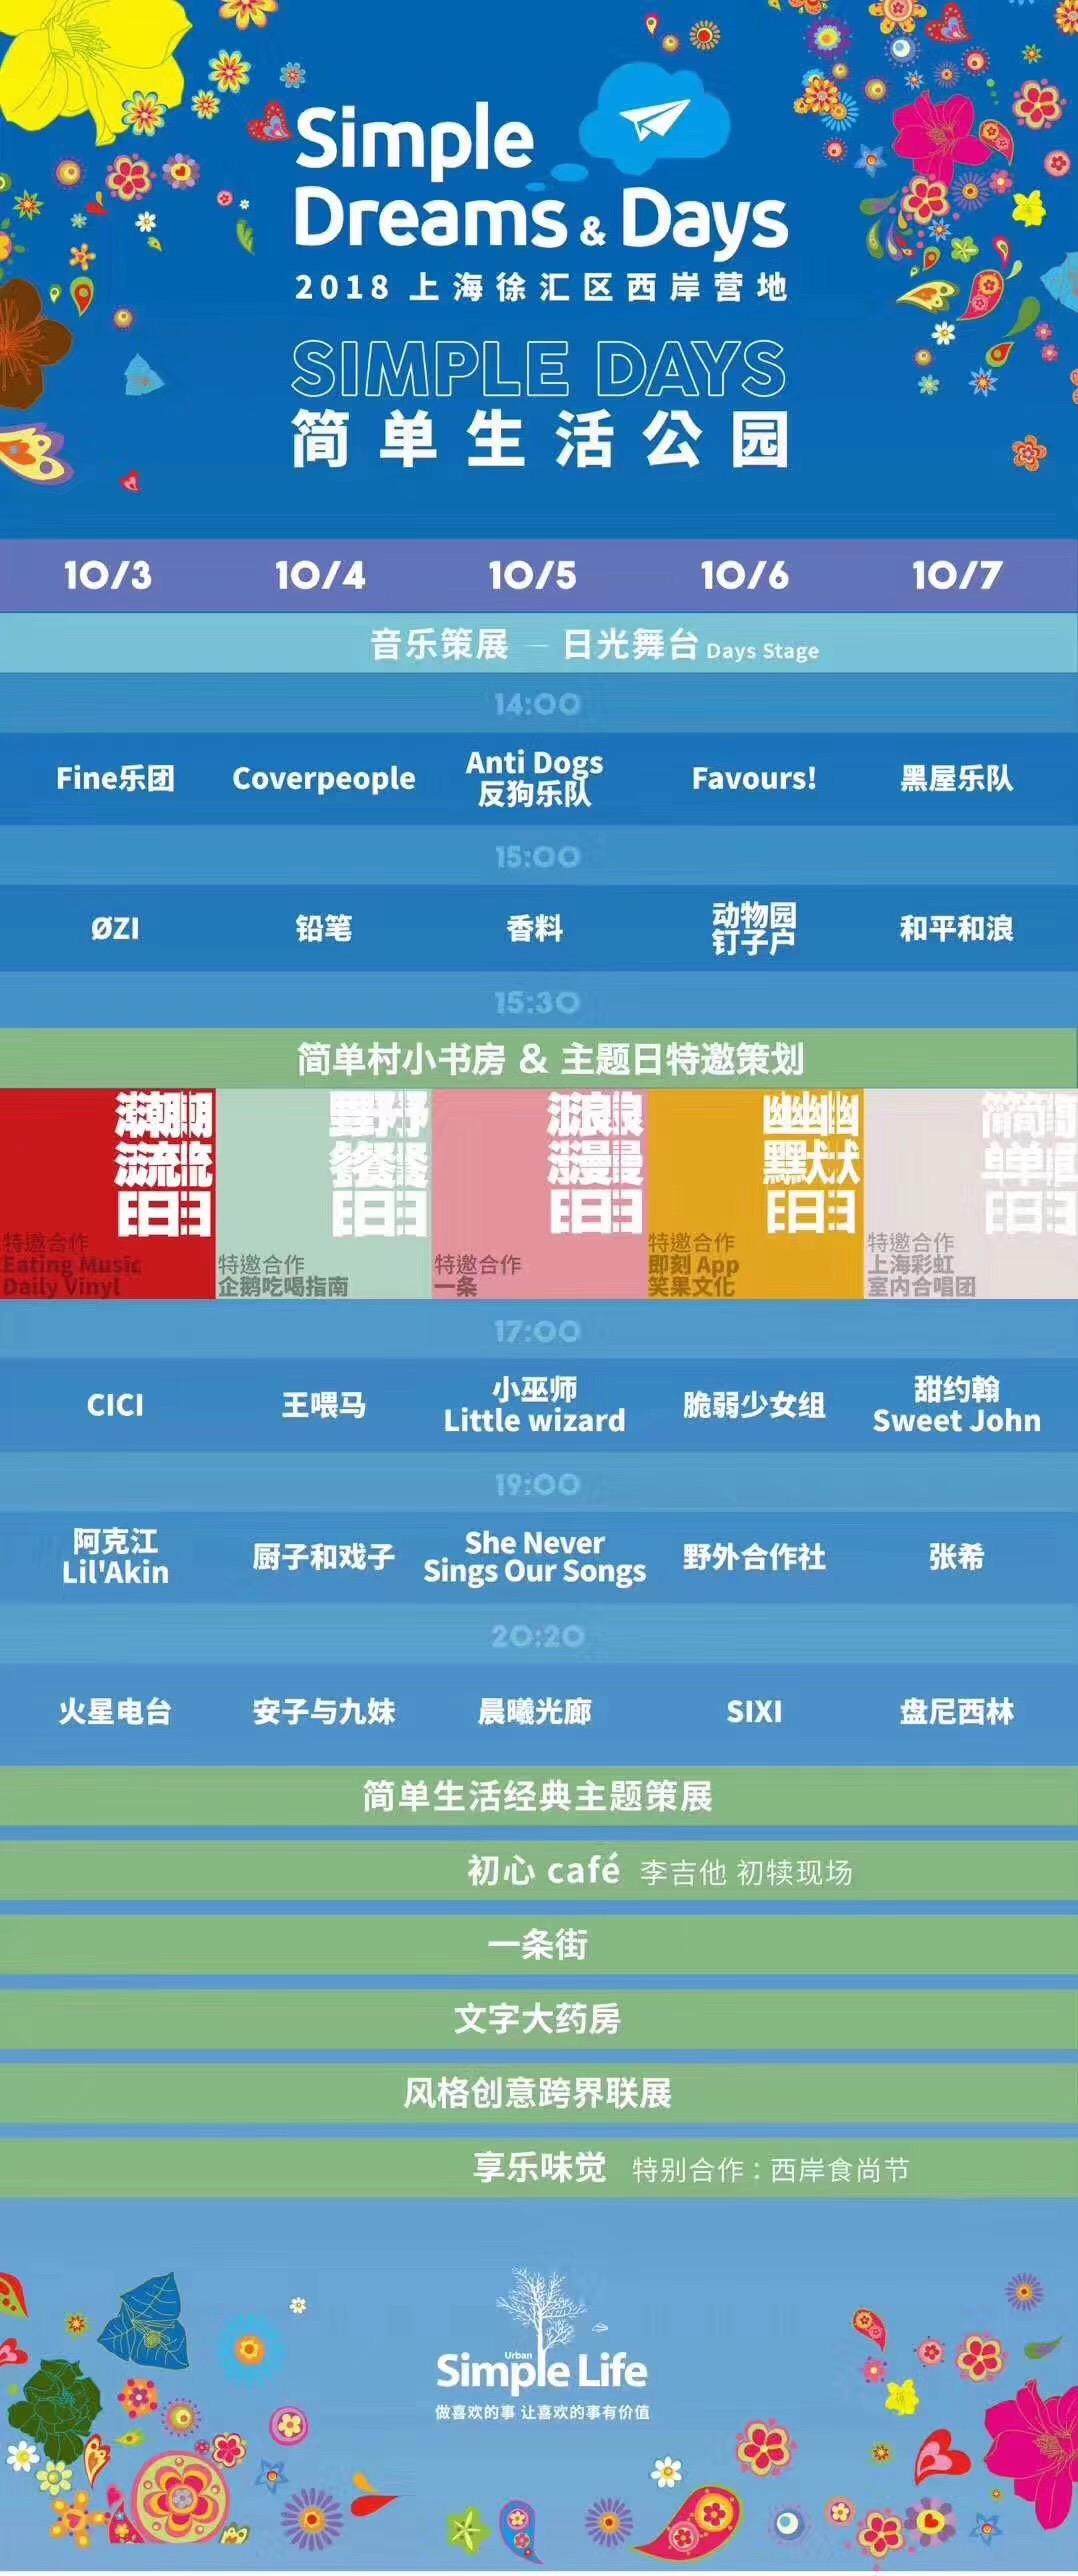 WeChat Image_20180905160003